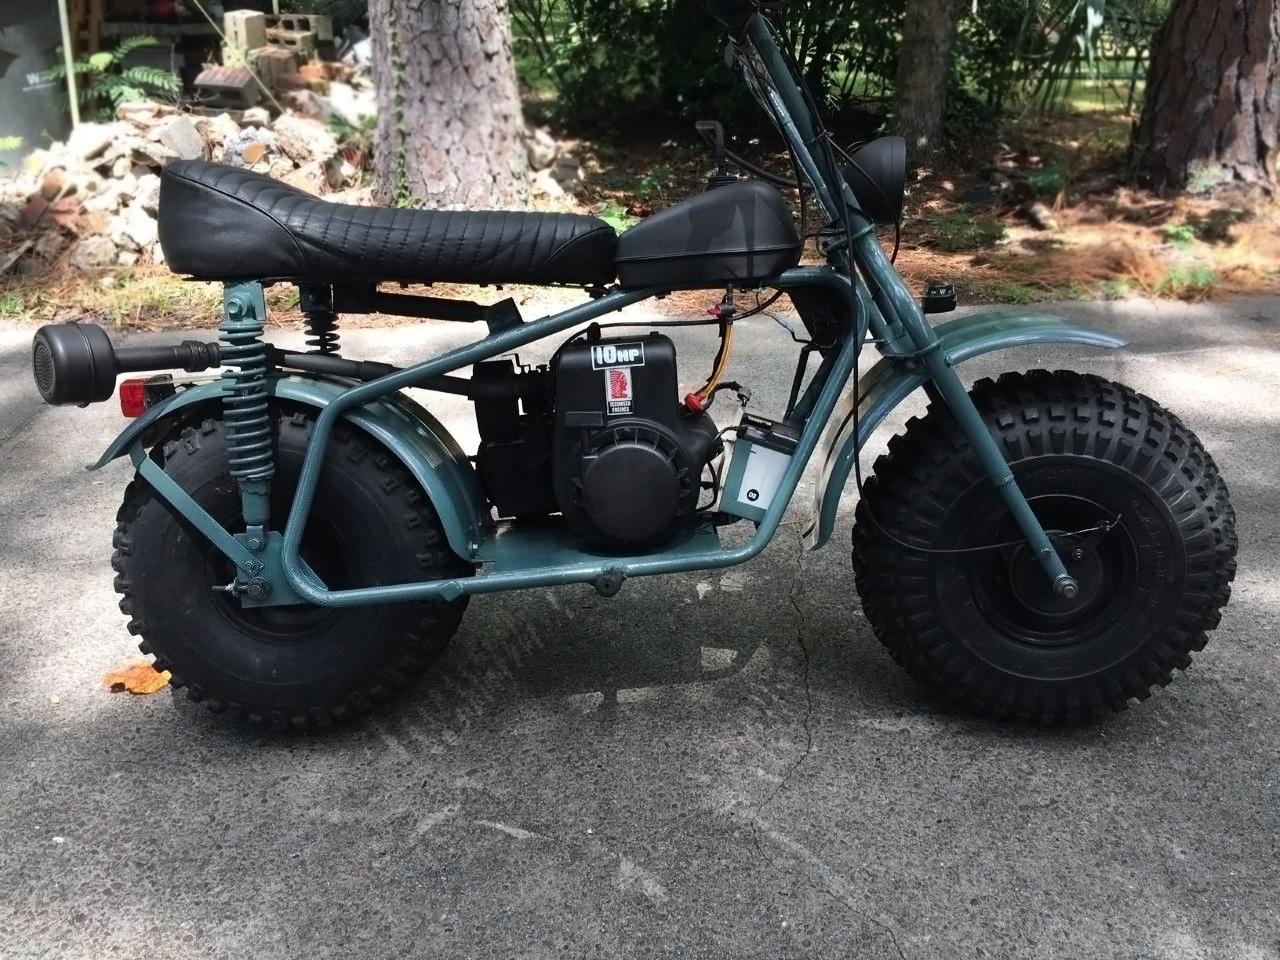 Bouncy Bronc 1971 Heald Vt 10 Super Honda 50cc Dirt Bike 091416 Barn Finds Vt10